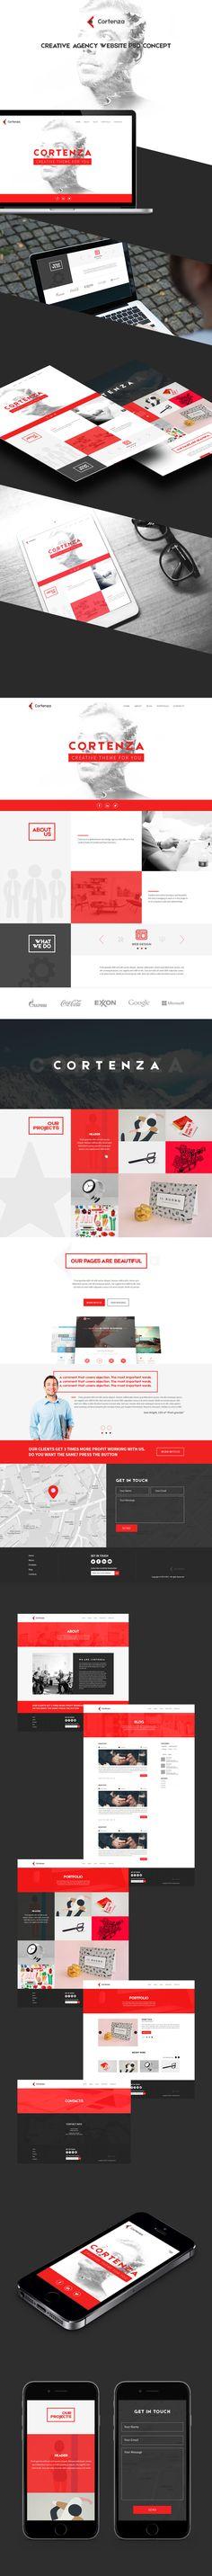 Cortenza - Creative Agency Website PSD Concept on Behance